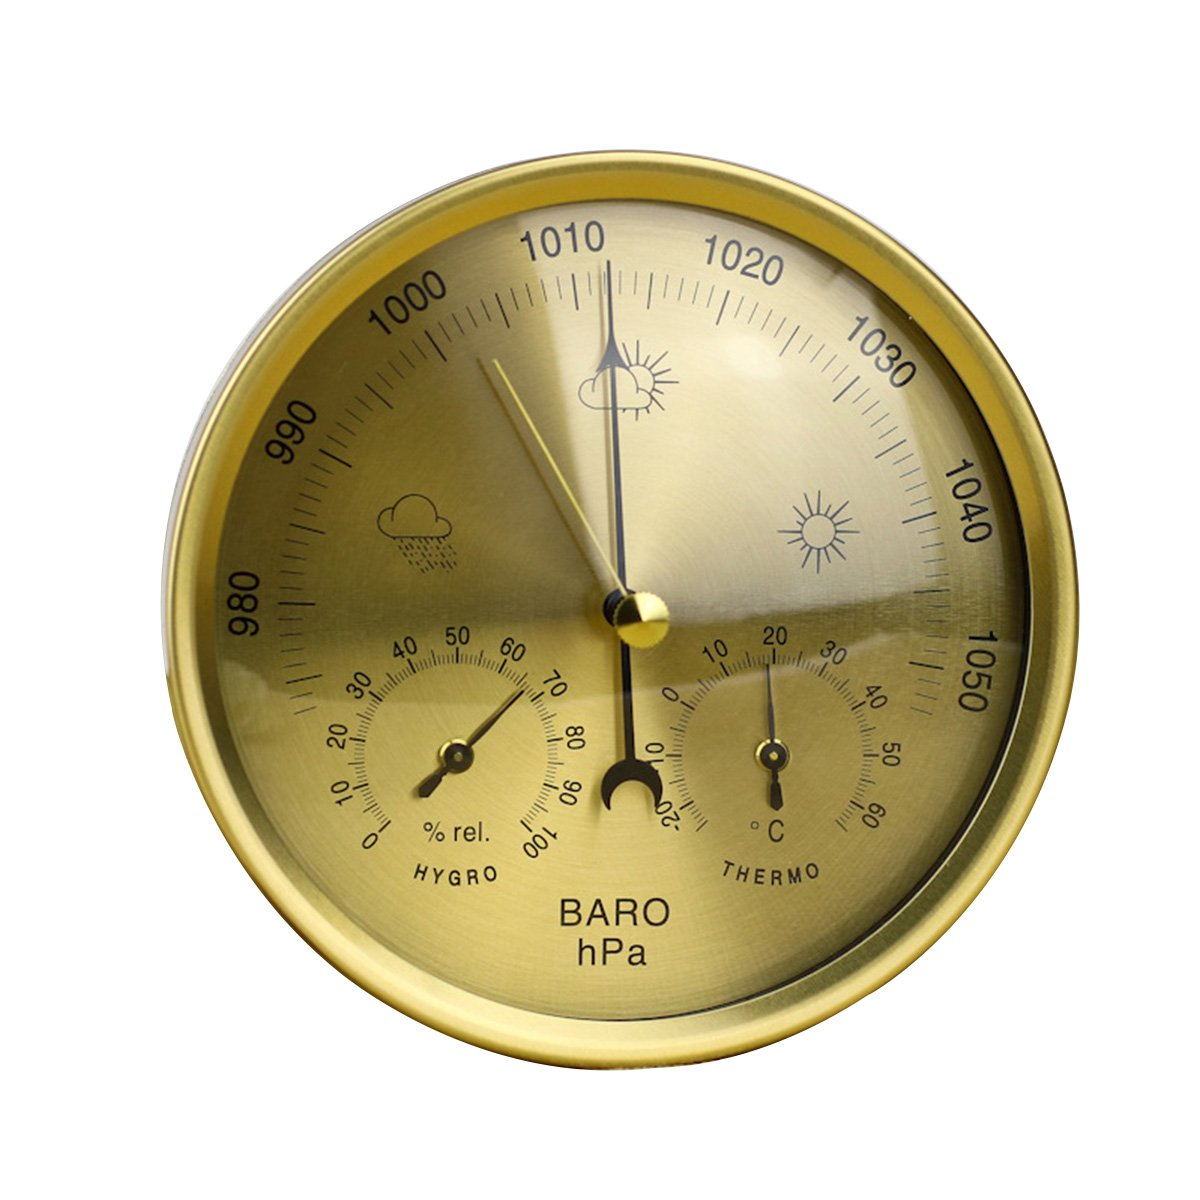 Yardwe 3 in 1 Barometer Weather Station Precision Aneroid Barometer Thermometer Hygrometer with Stainless Steel Frame (Yellow)